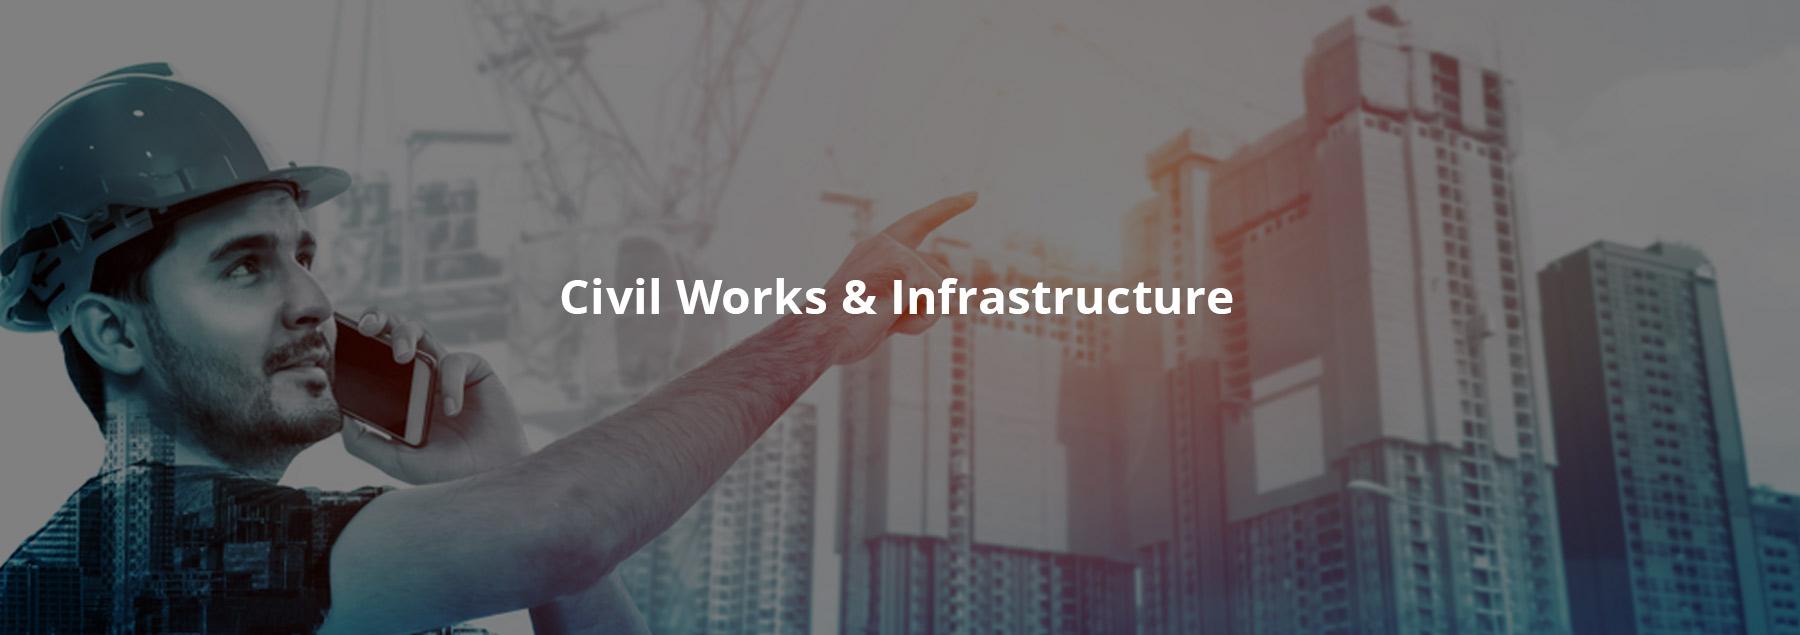 Civil Works & Infrastructure